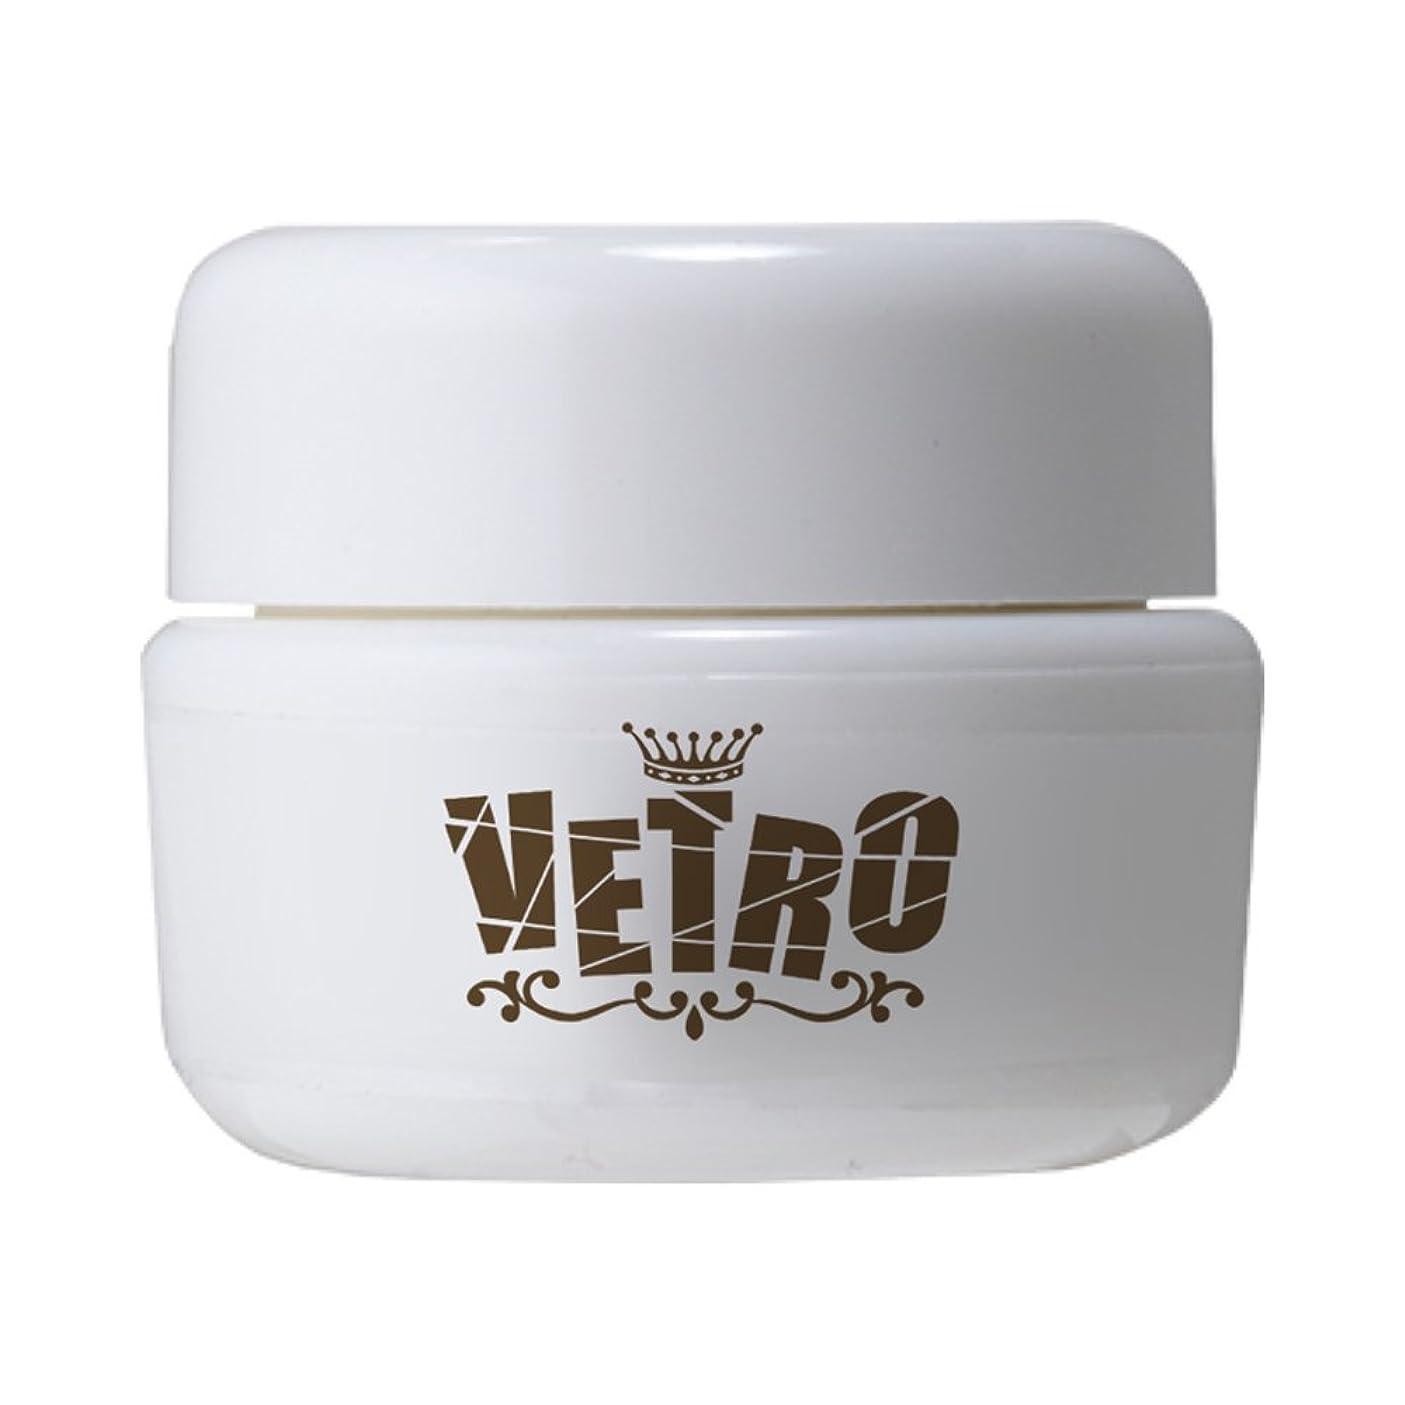 VETRO No.19 カラージェル グリッター VL316 ストーンホワイト 4ml